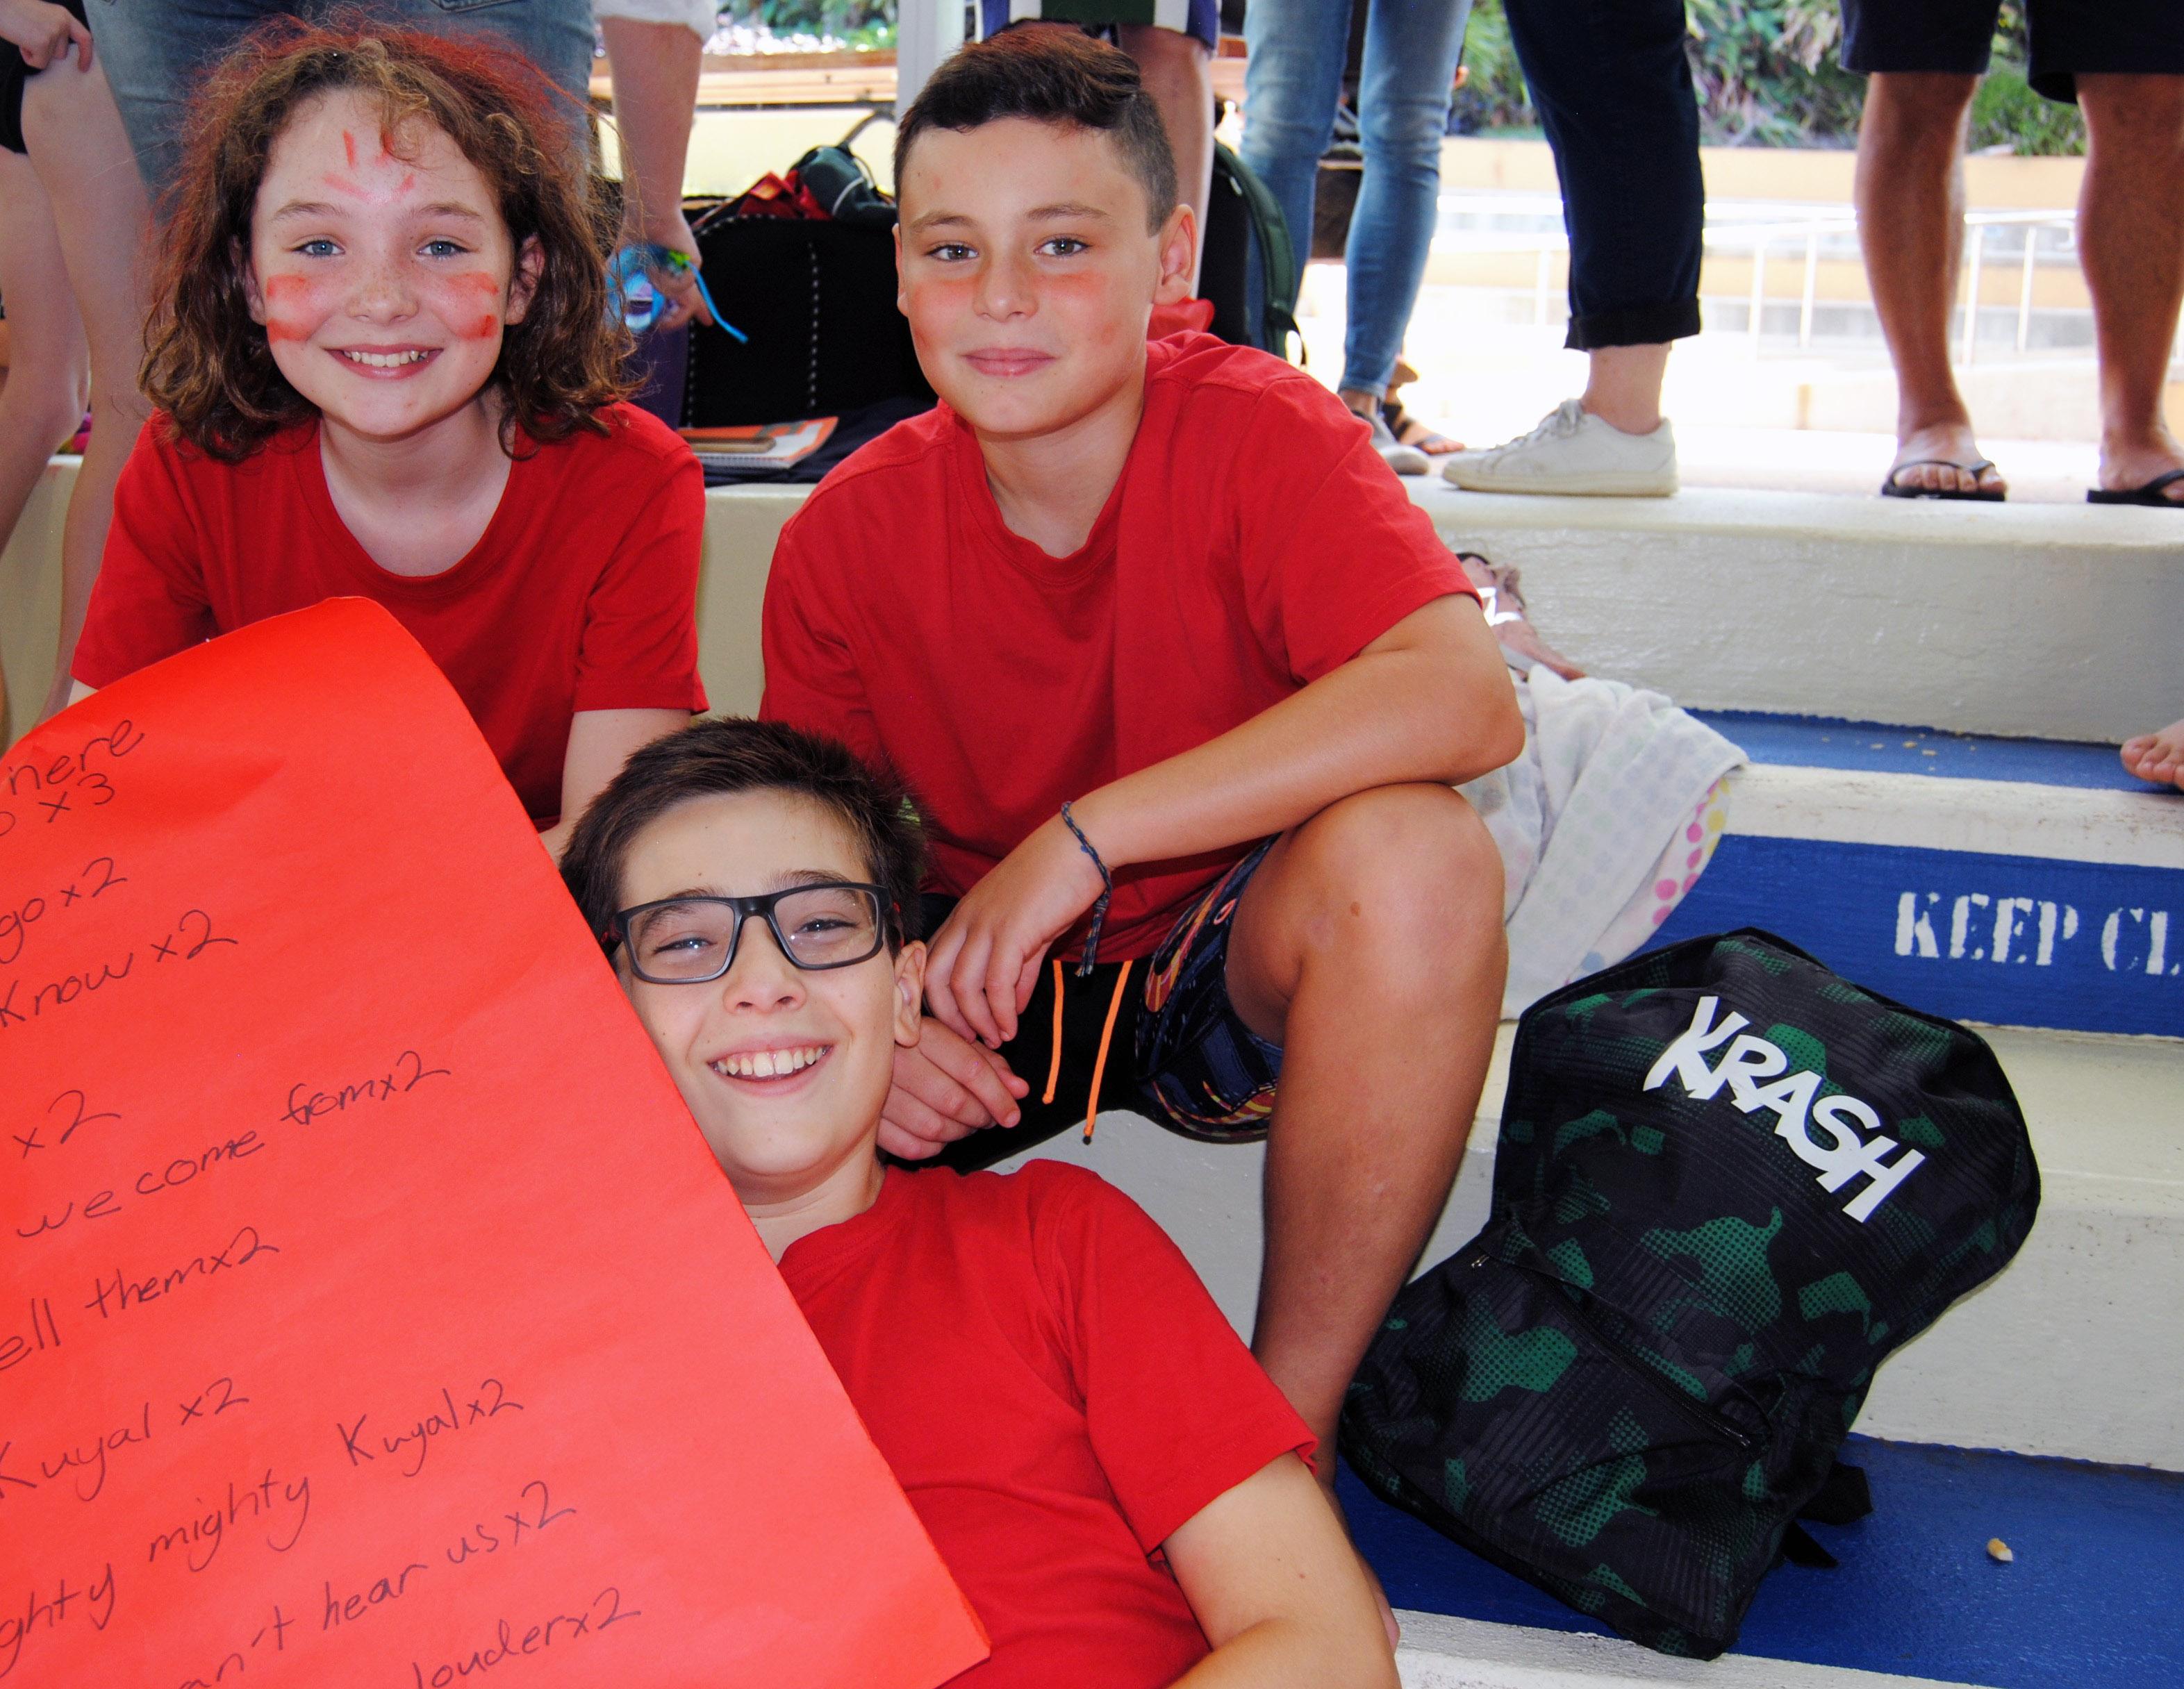 igs-primary-school-swimming-carnival-pool-race-cheering-2